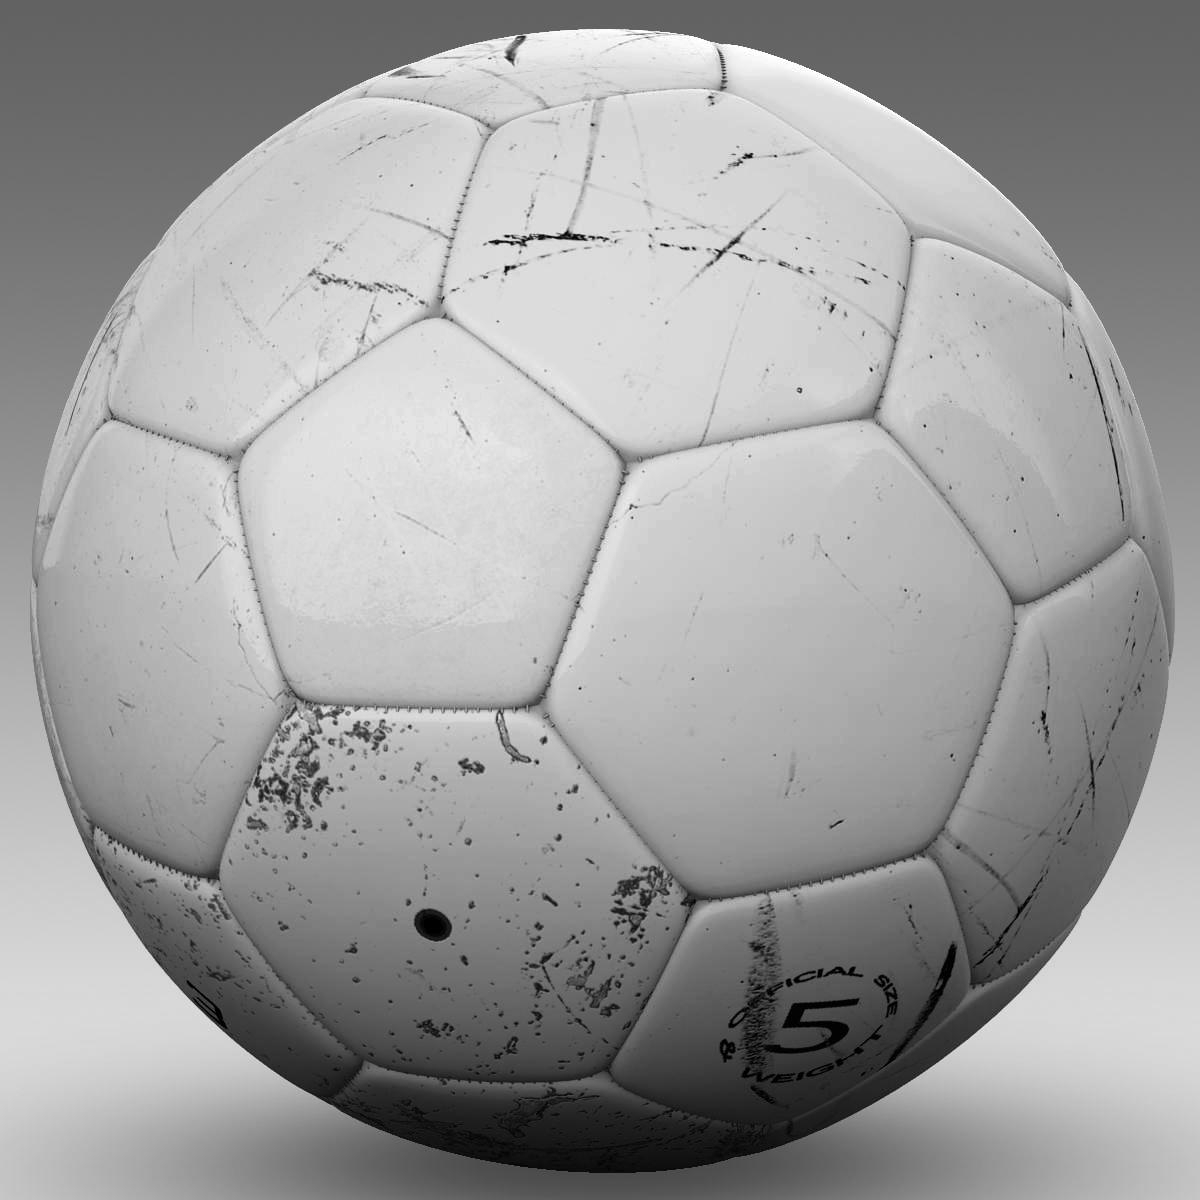 soccerball цагаан 3d загвар 3ds max fbx c4d ma mb obj 205183